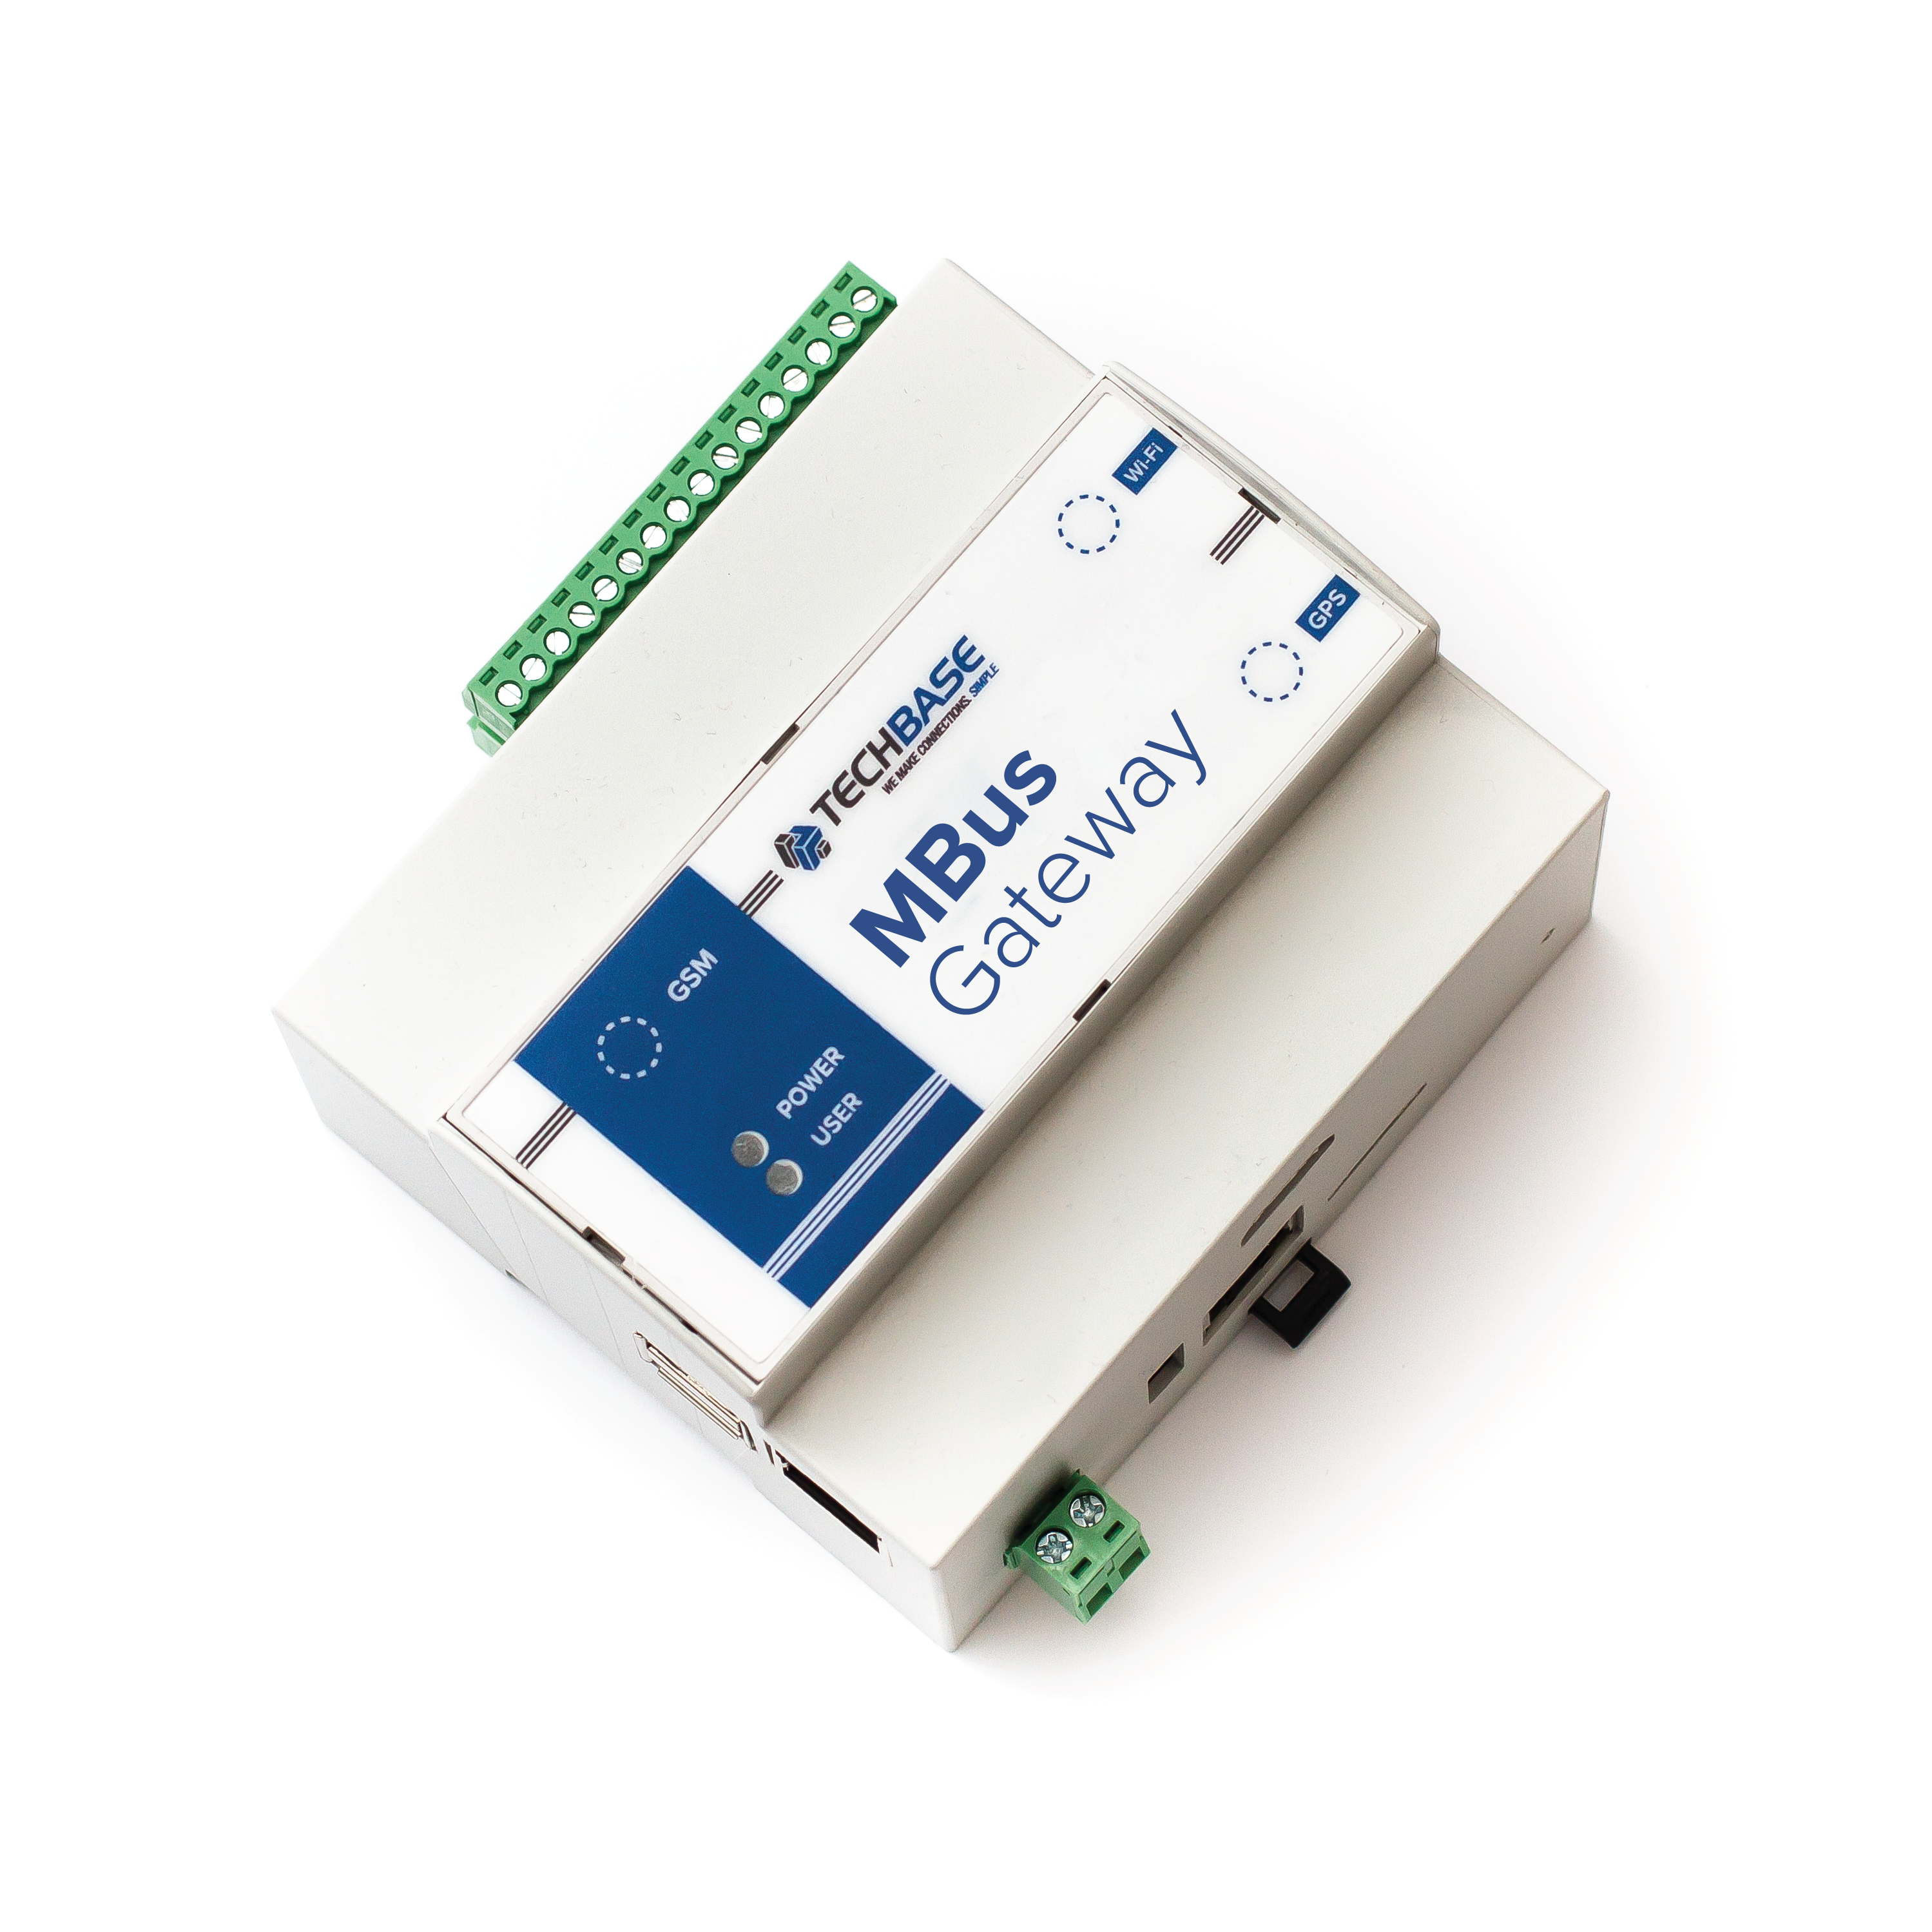 MBUS-GAT-400: Gateway MODBUS TCP- Meterbus max 400 slave